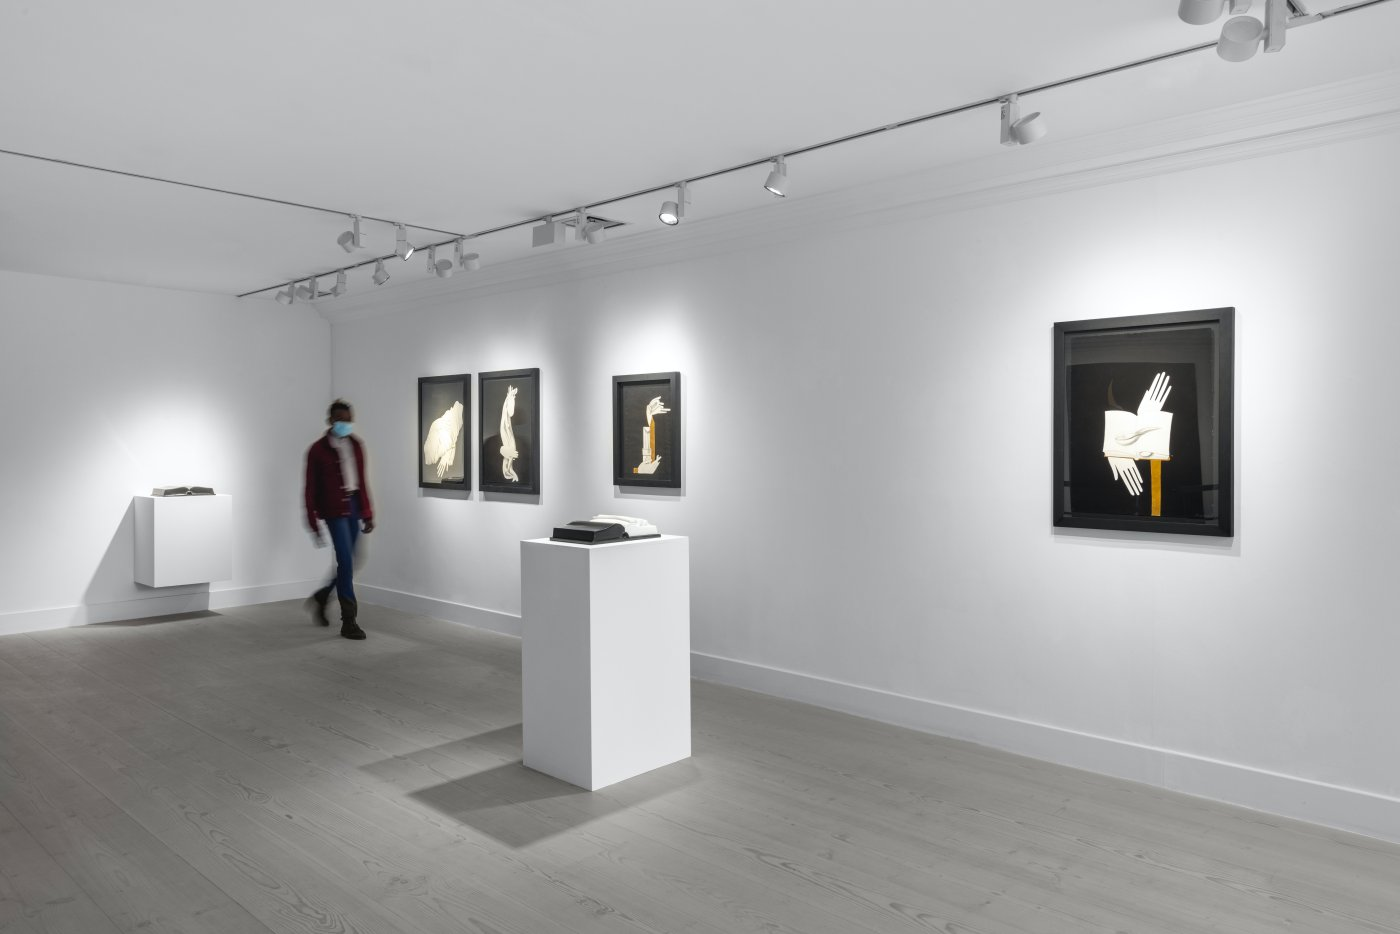 Gazelli Art House Aidan Salakhova 3